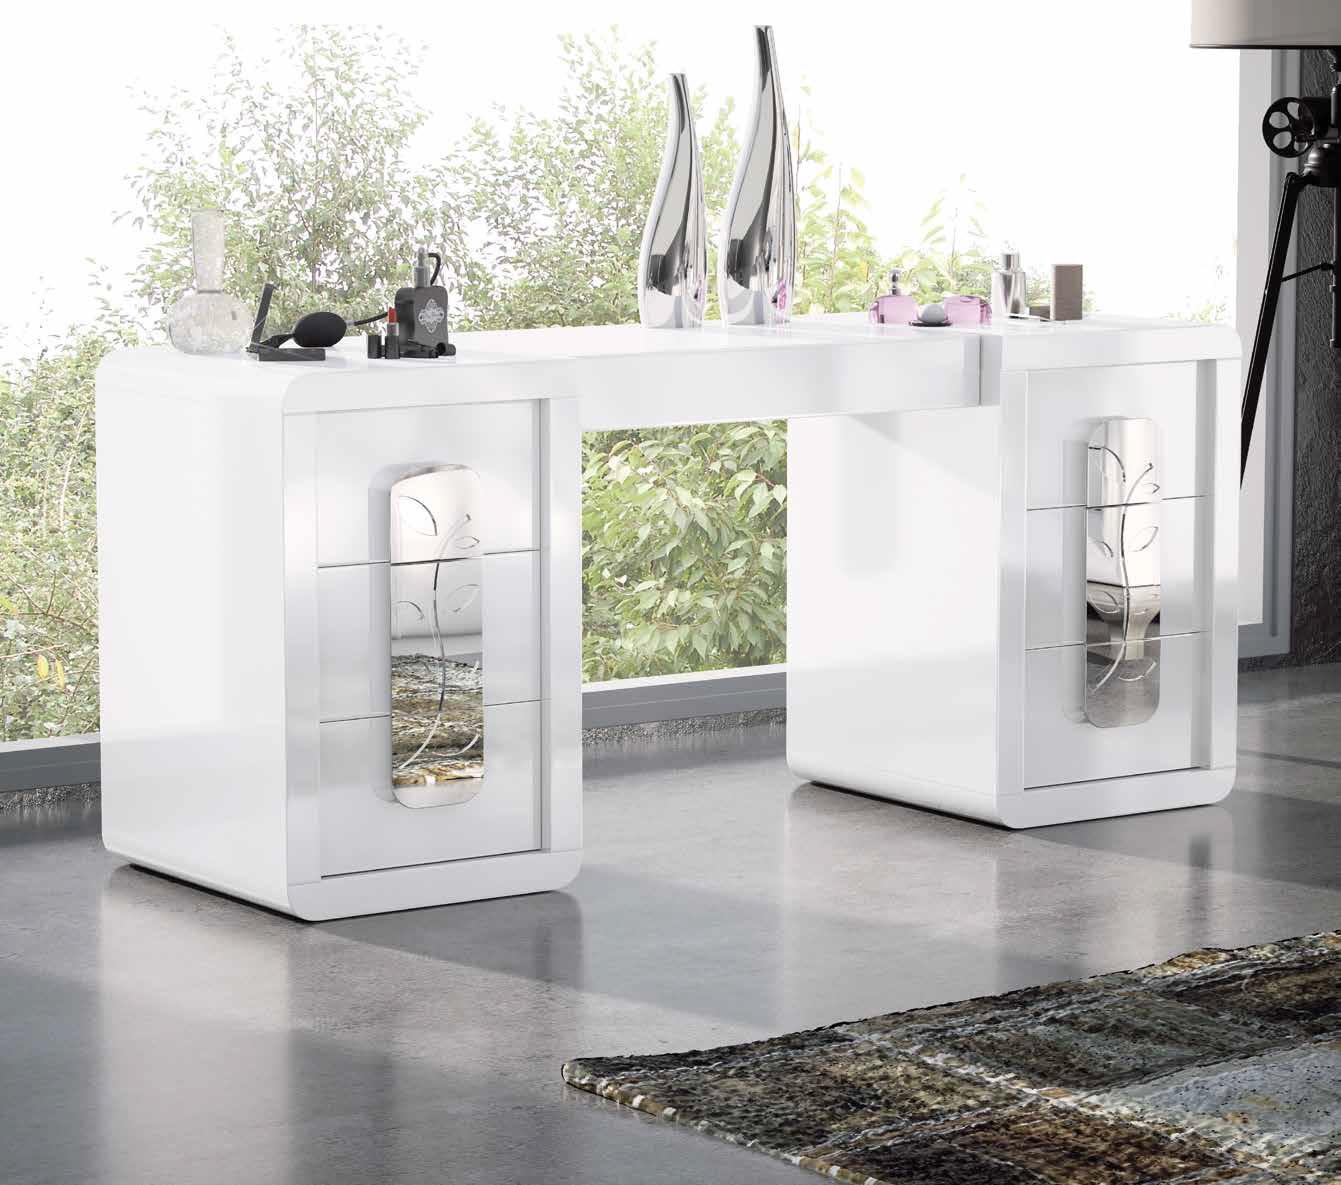 tocadores-Vol-3-muebles-paco-caballero-1220-5caf77ade5645